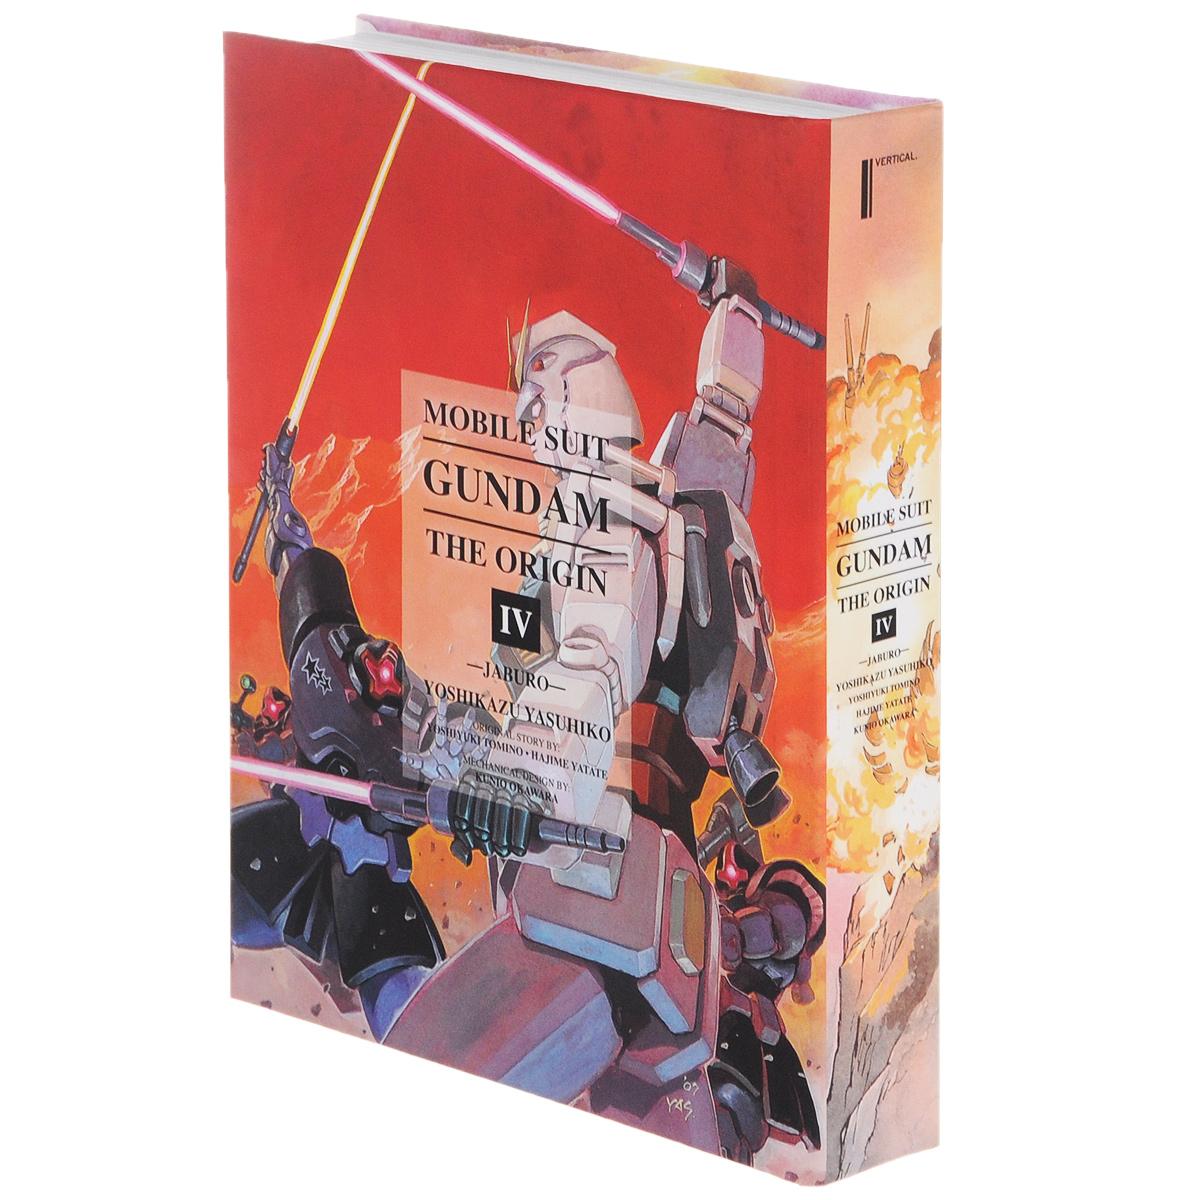 Mobile Suit Gundam: The Origin: Volume 4: Jaburo гарнитура bb mobile micron 4 white